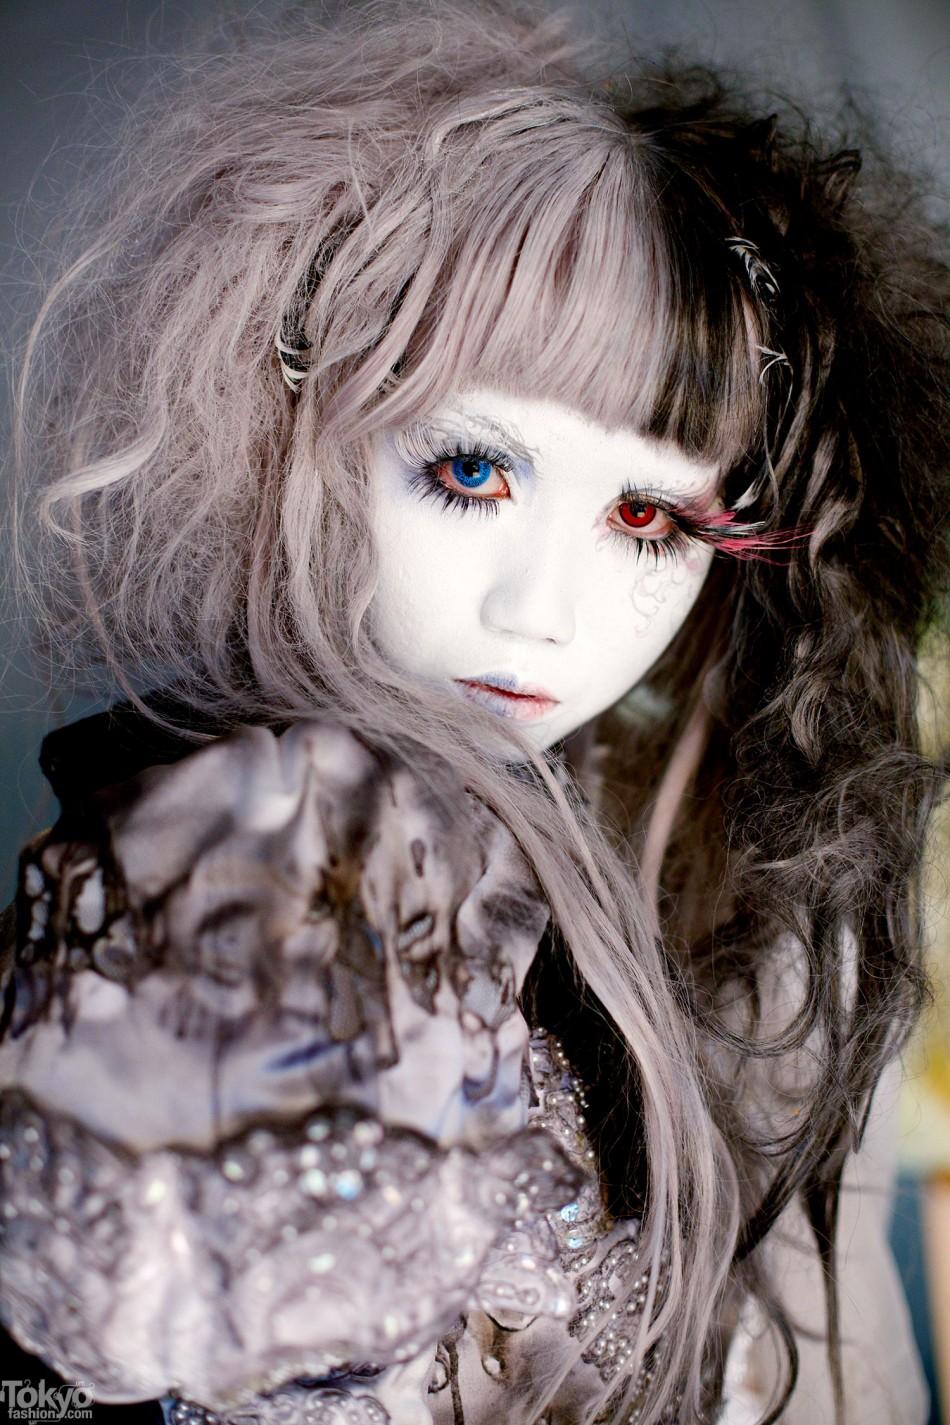 Minori - Her Memories of a Dream (9)